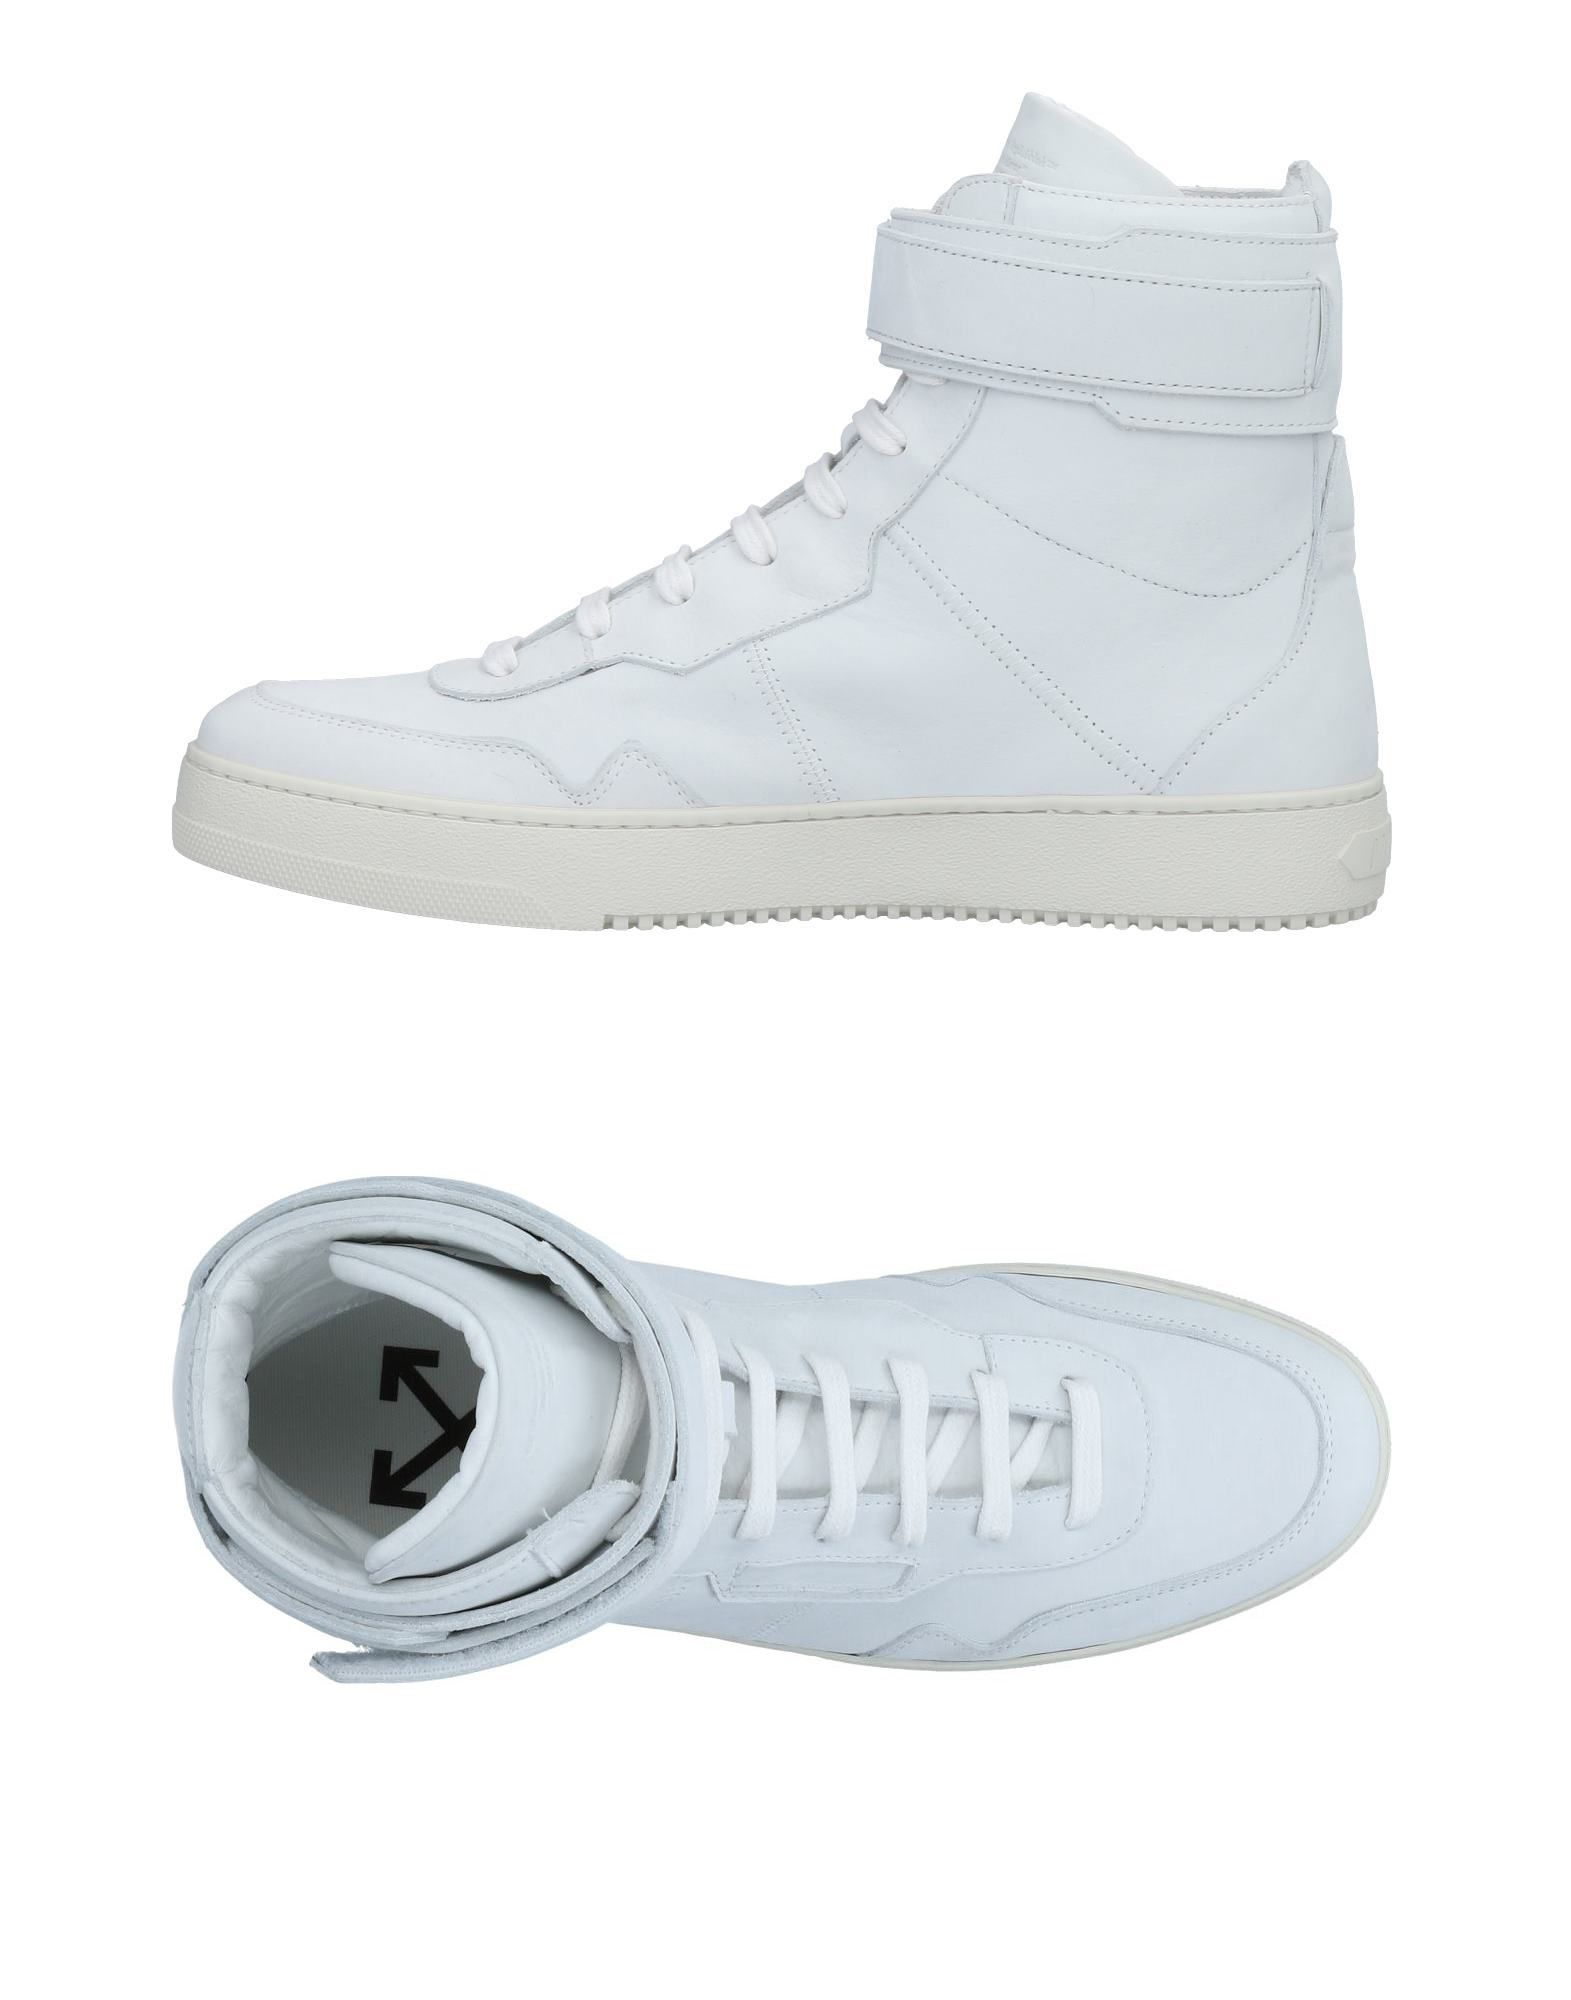 OFF-WHITE™ Высокие кеды и кроссовки кеды кроссовки высокие dc evan hi zero black white